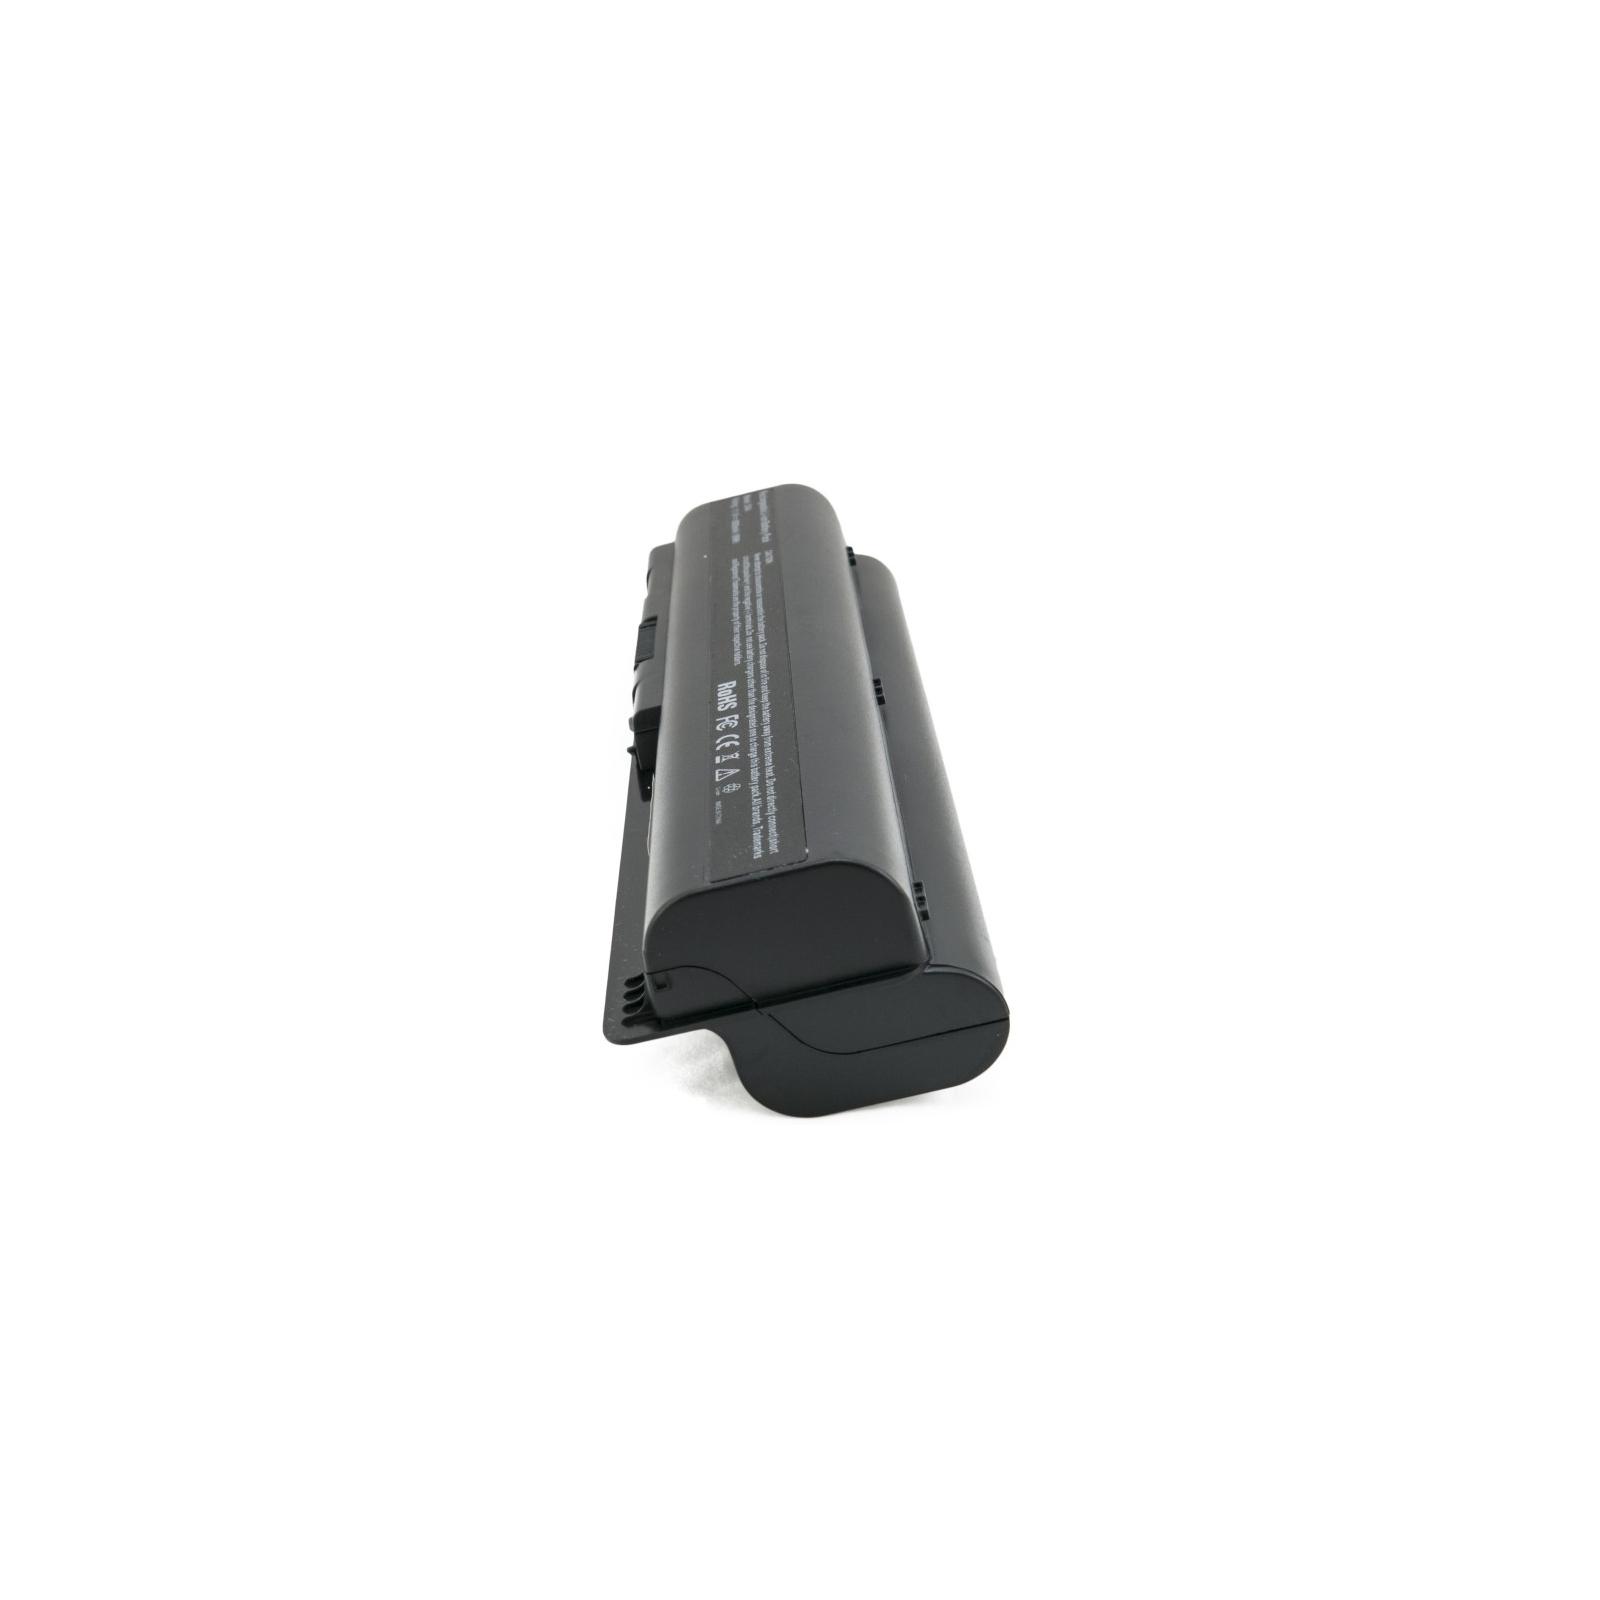 Аккумулятор для ноутбука HP Pavilion DV4 (HSTNN-DB73) 8800 mAh EXTRADIGITAL (BNH3945) изображение 5